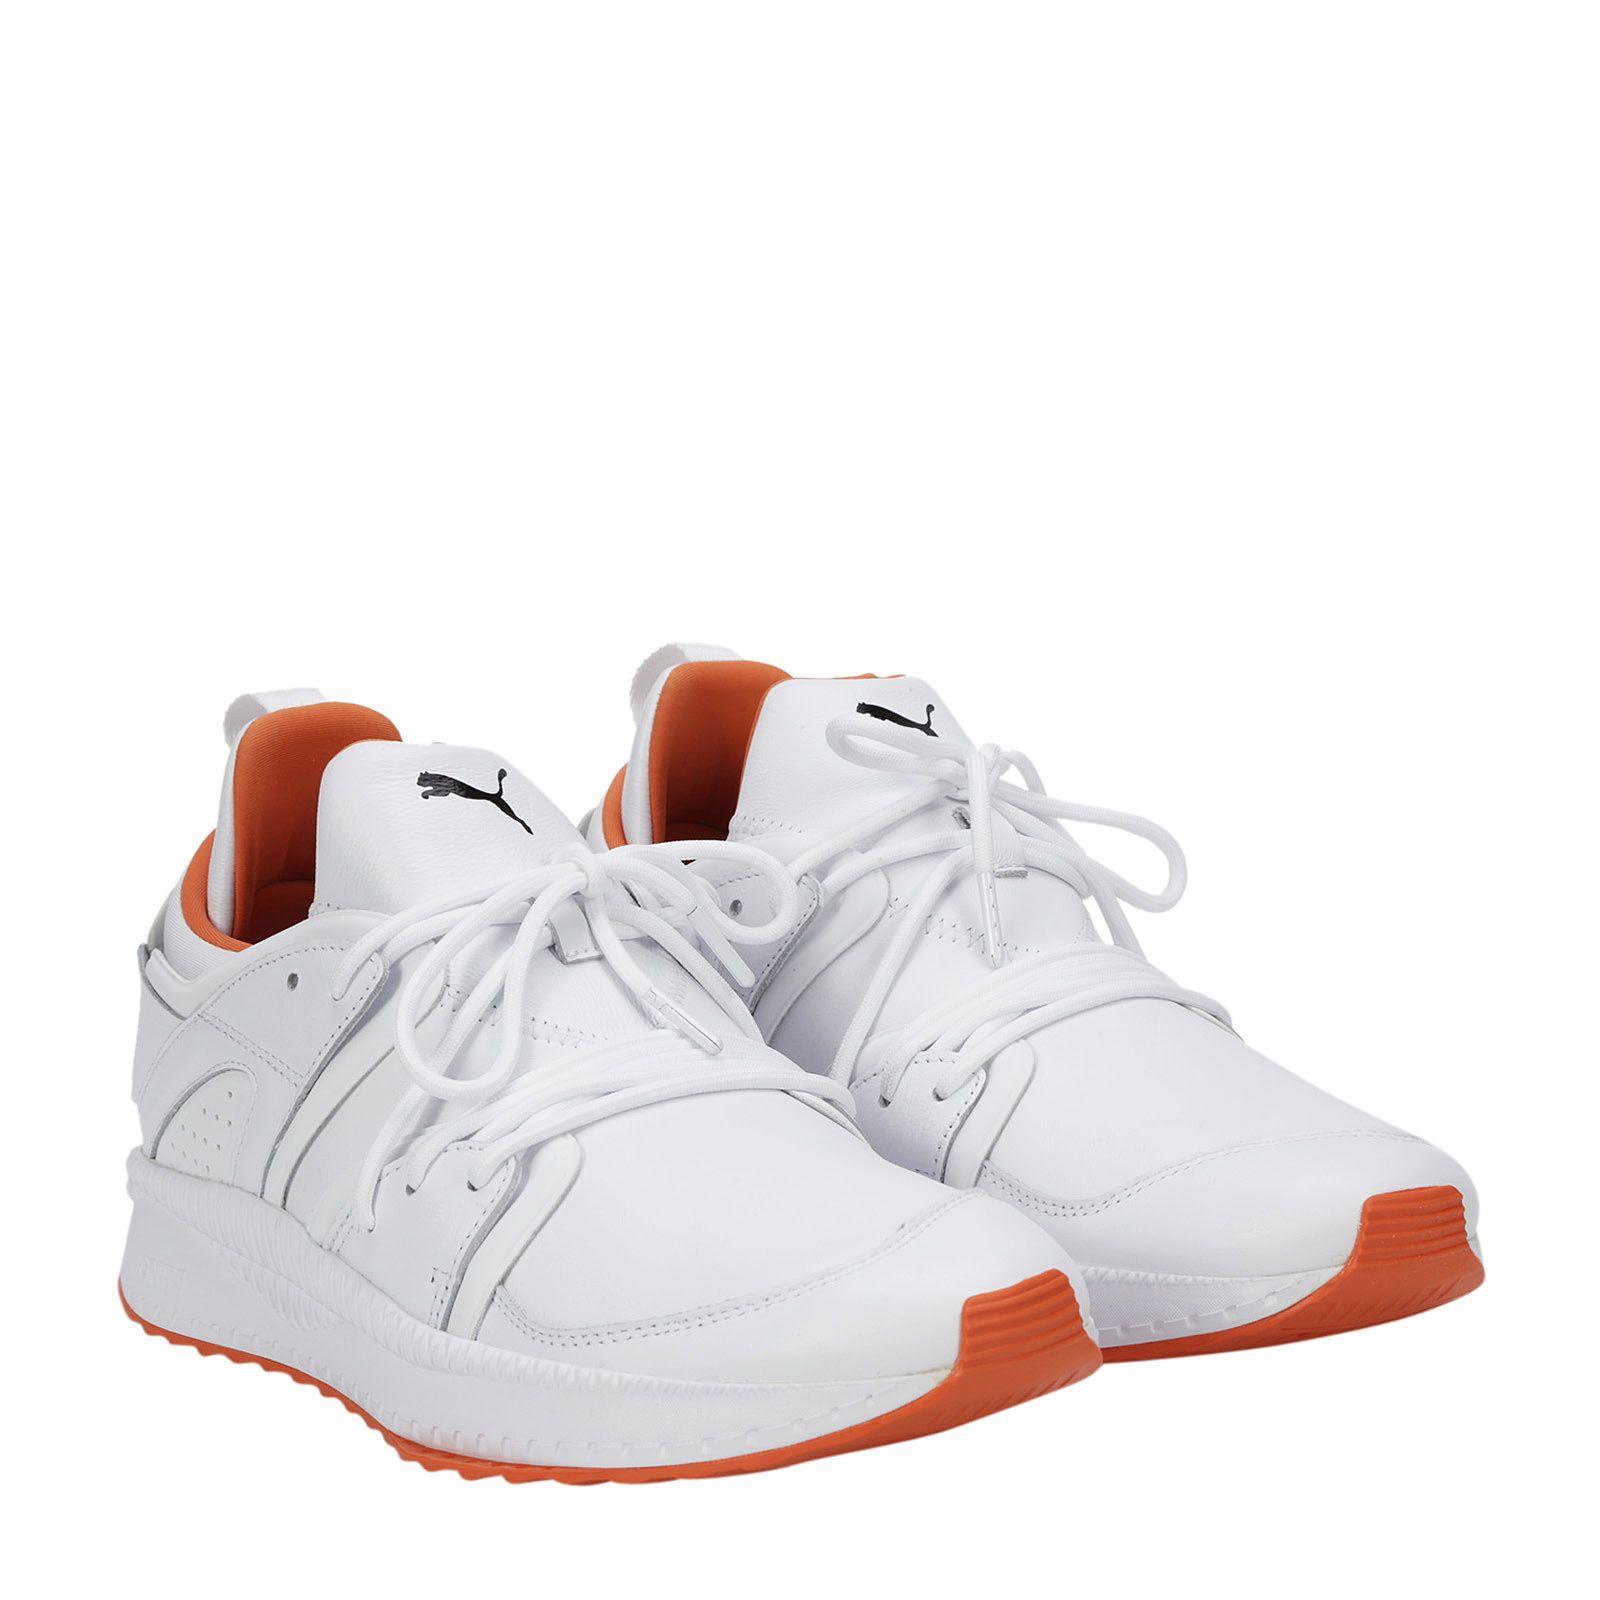 Puma Puma X Trapstar Tsugi Blaze Sneakers